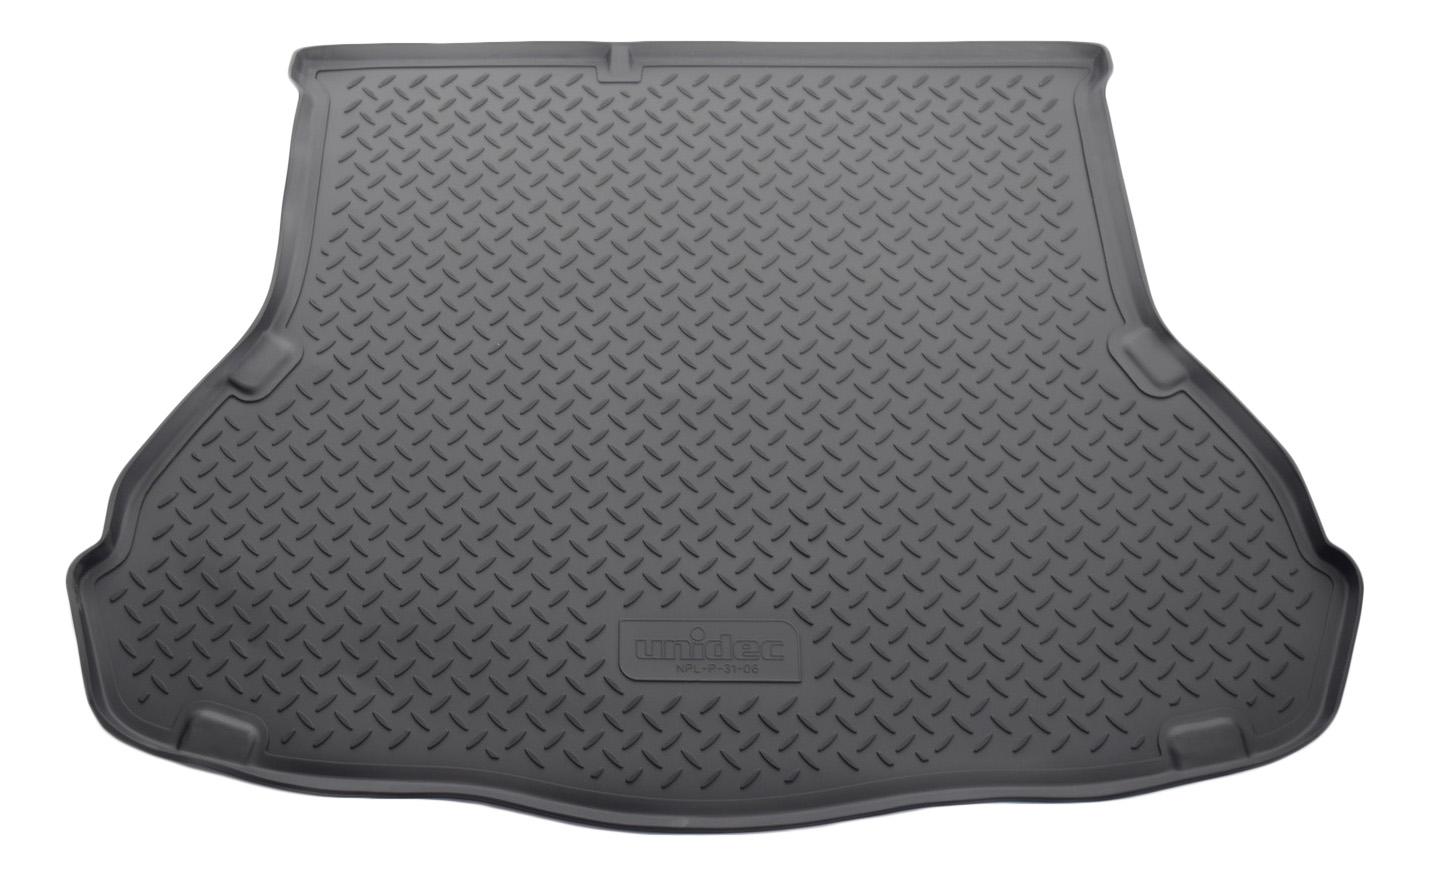 Коврик в багажник автомобиля для Hyundai Norplast (NPL-P-31-06) фото